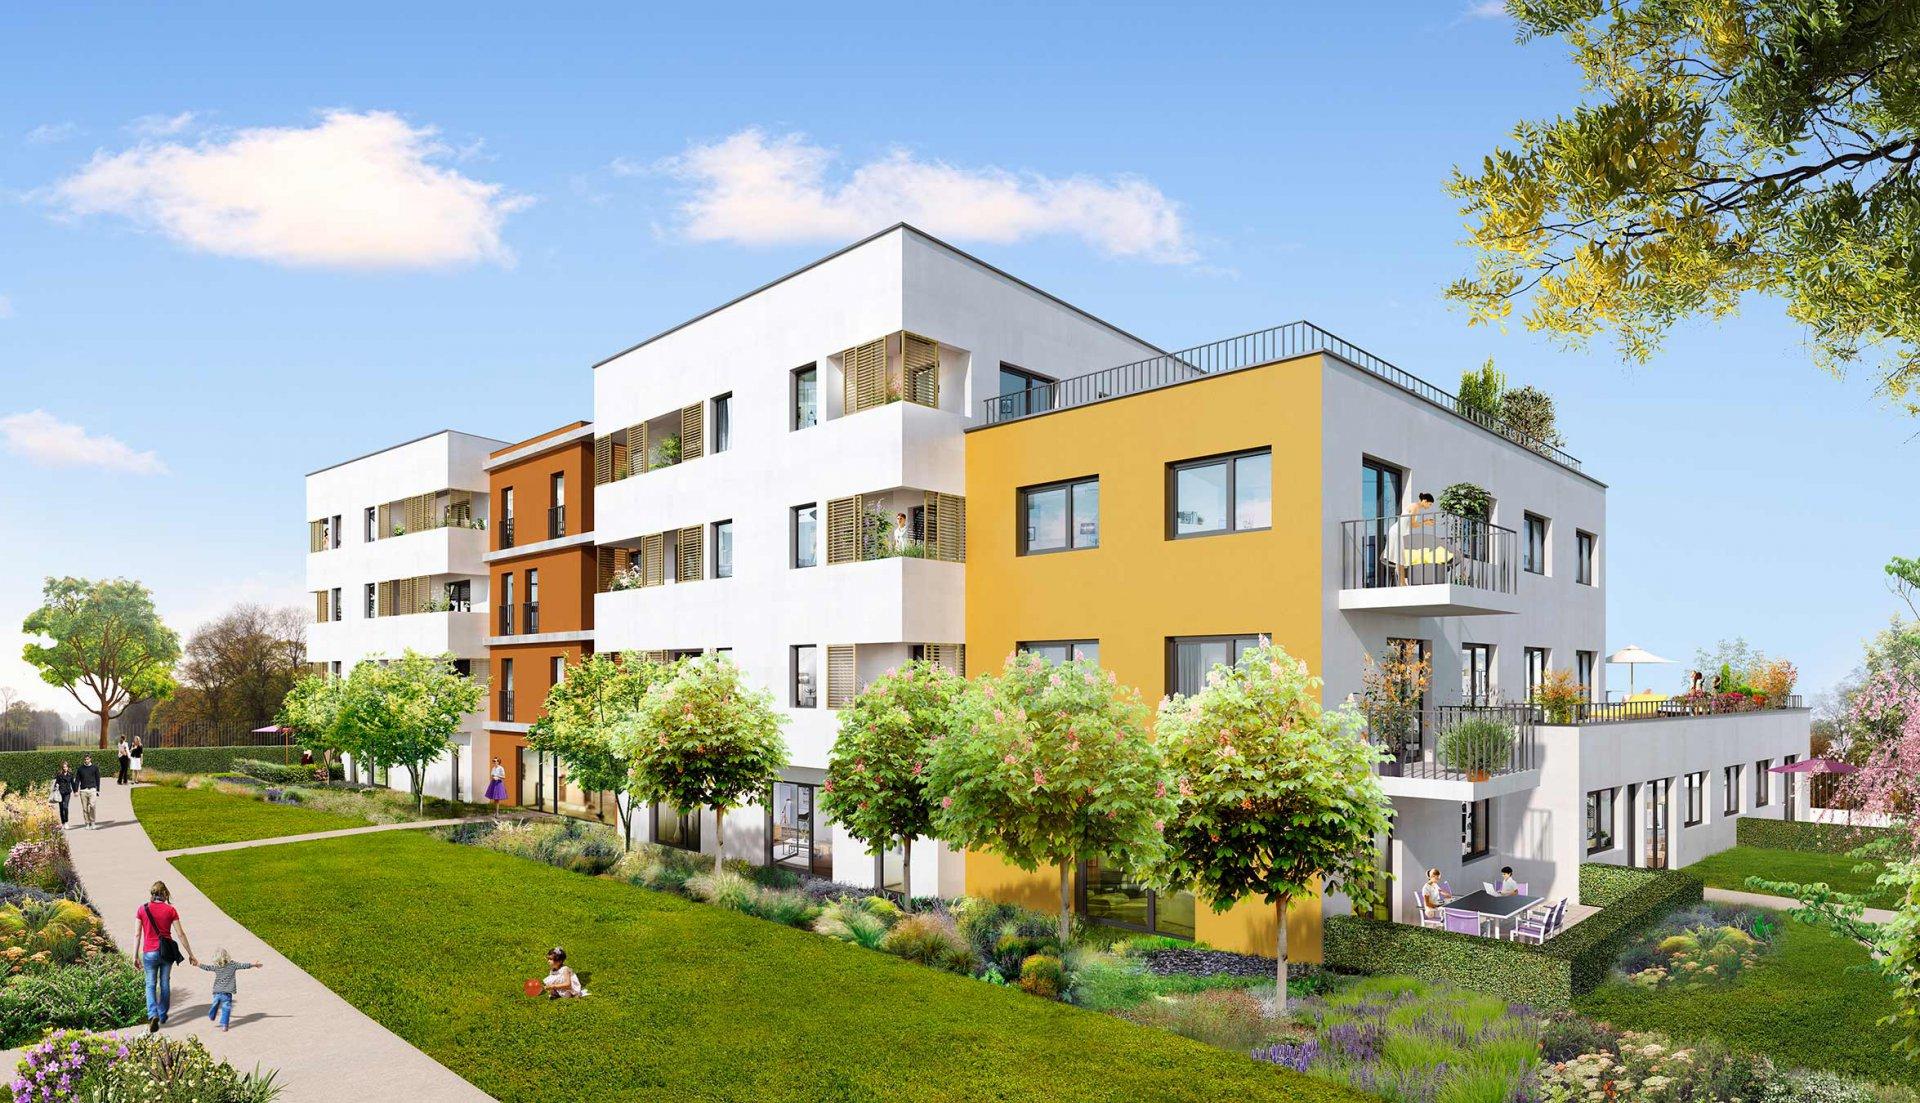 Programme Immeuble - Le Bourget